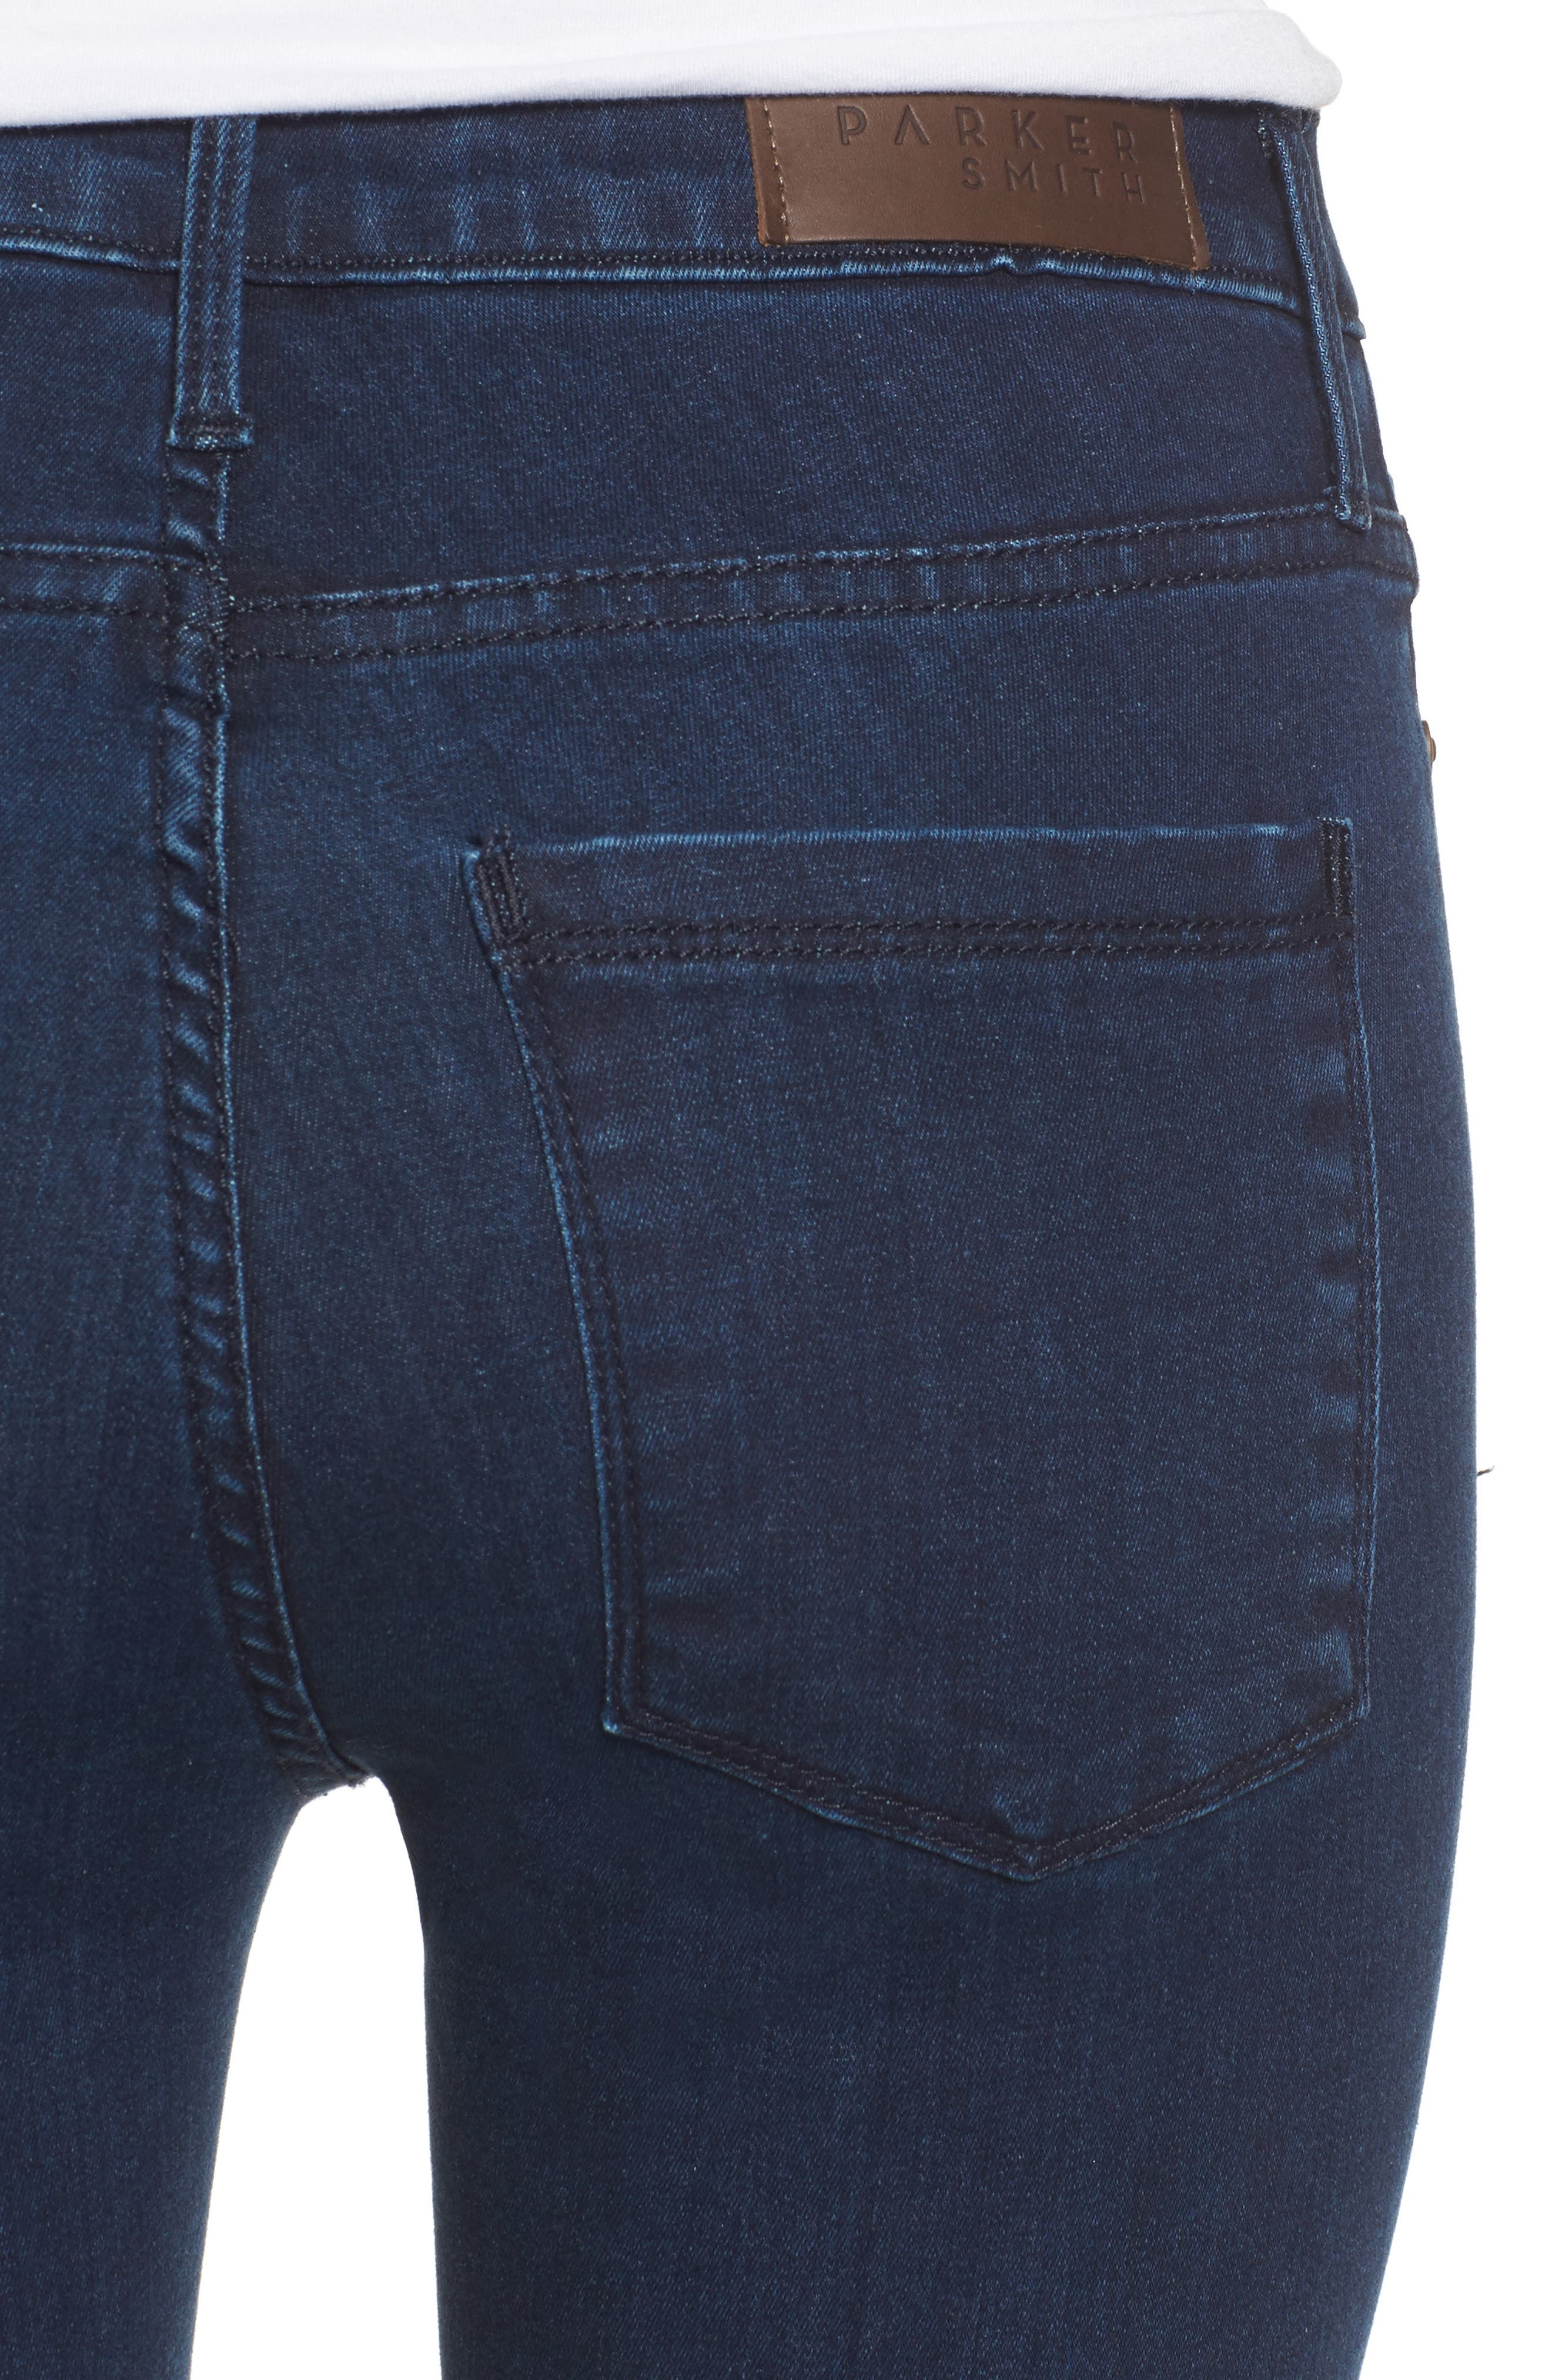 Alternate Image 4  - Parker Smith Bombshell High Waist Skinny Jeans (Sky Line)